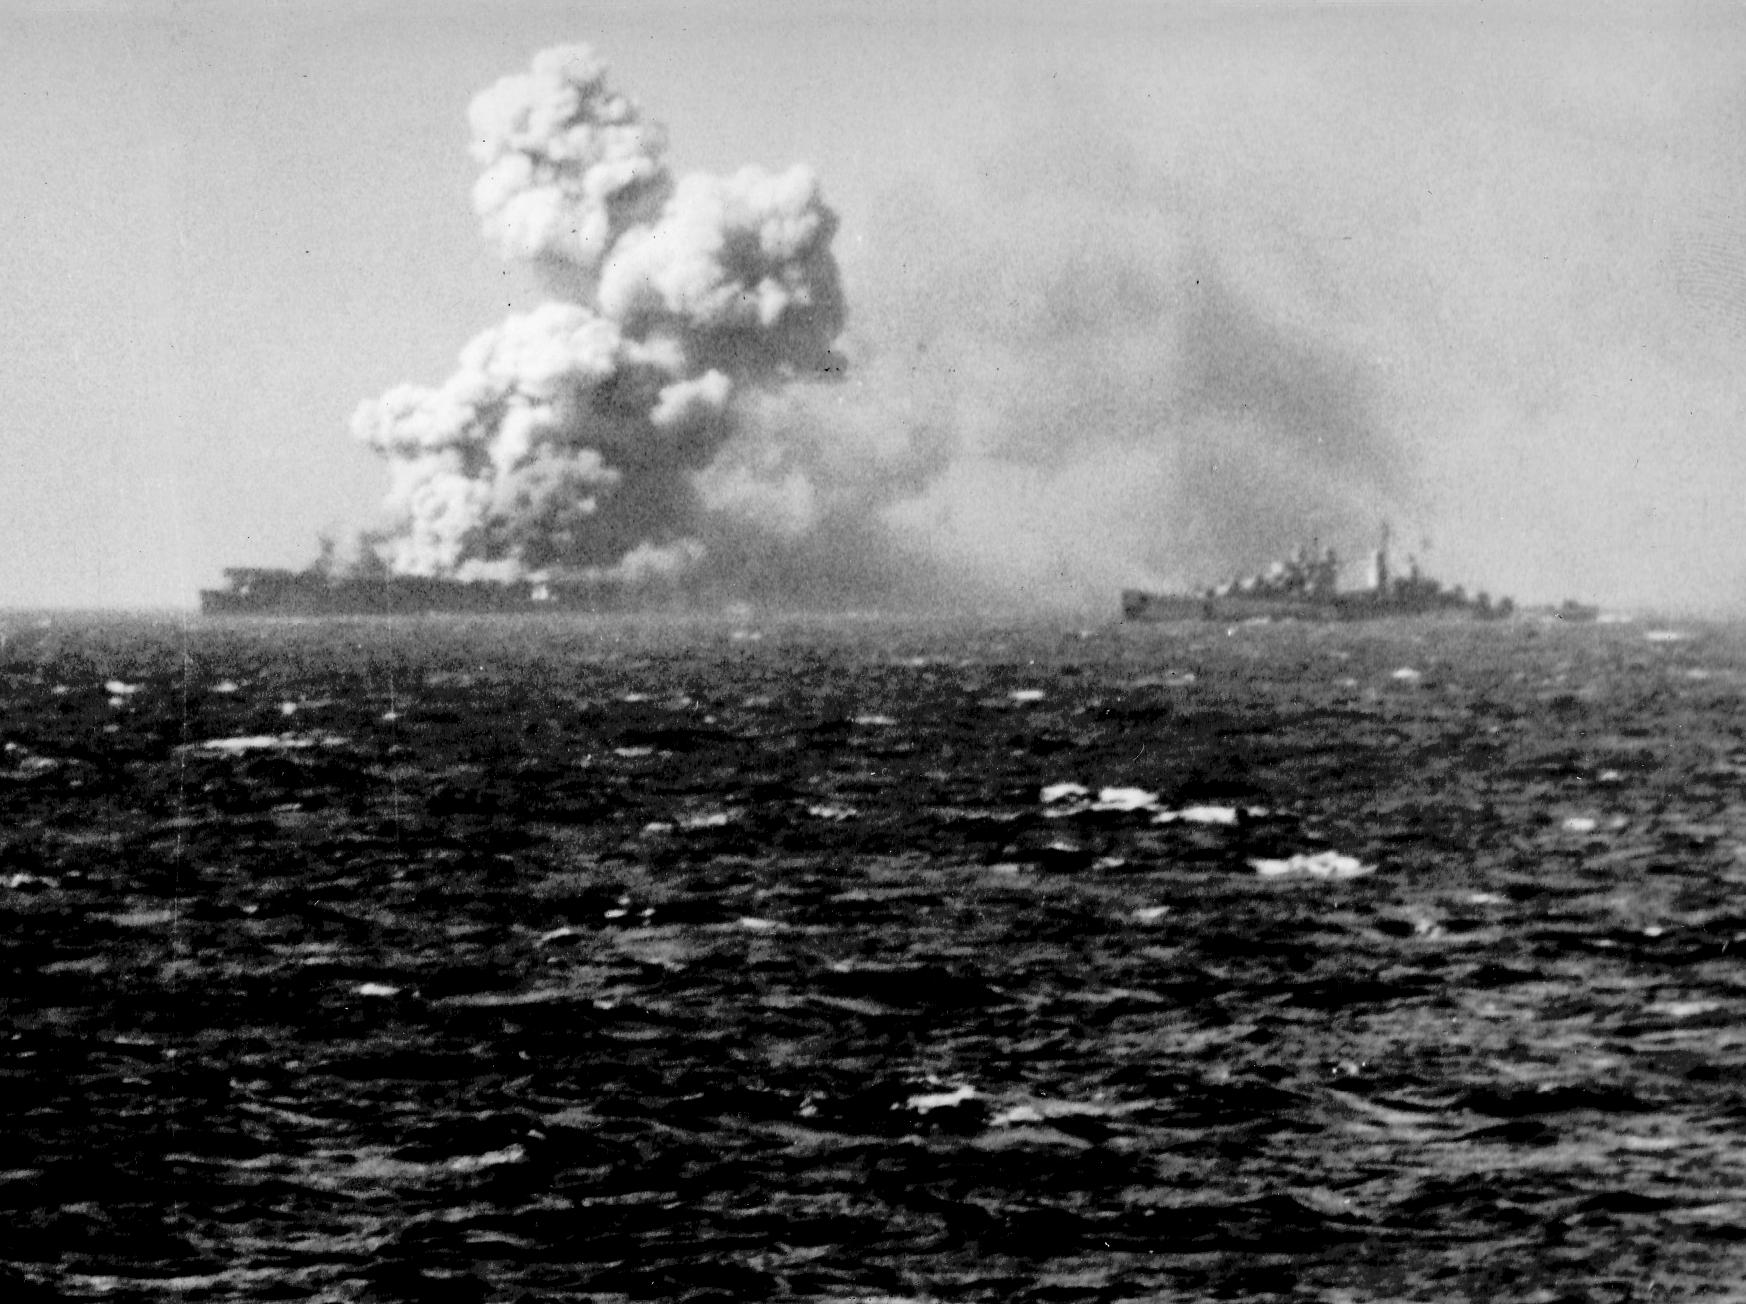 USS_Princeton_%28CVL-23%29_1944_10_24_1523explosion.jpg